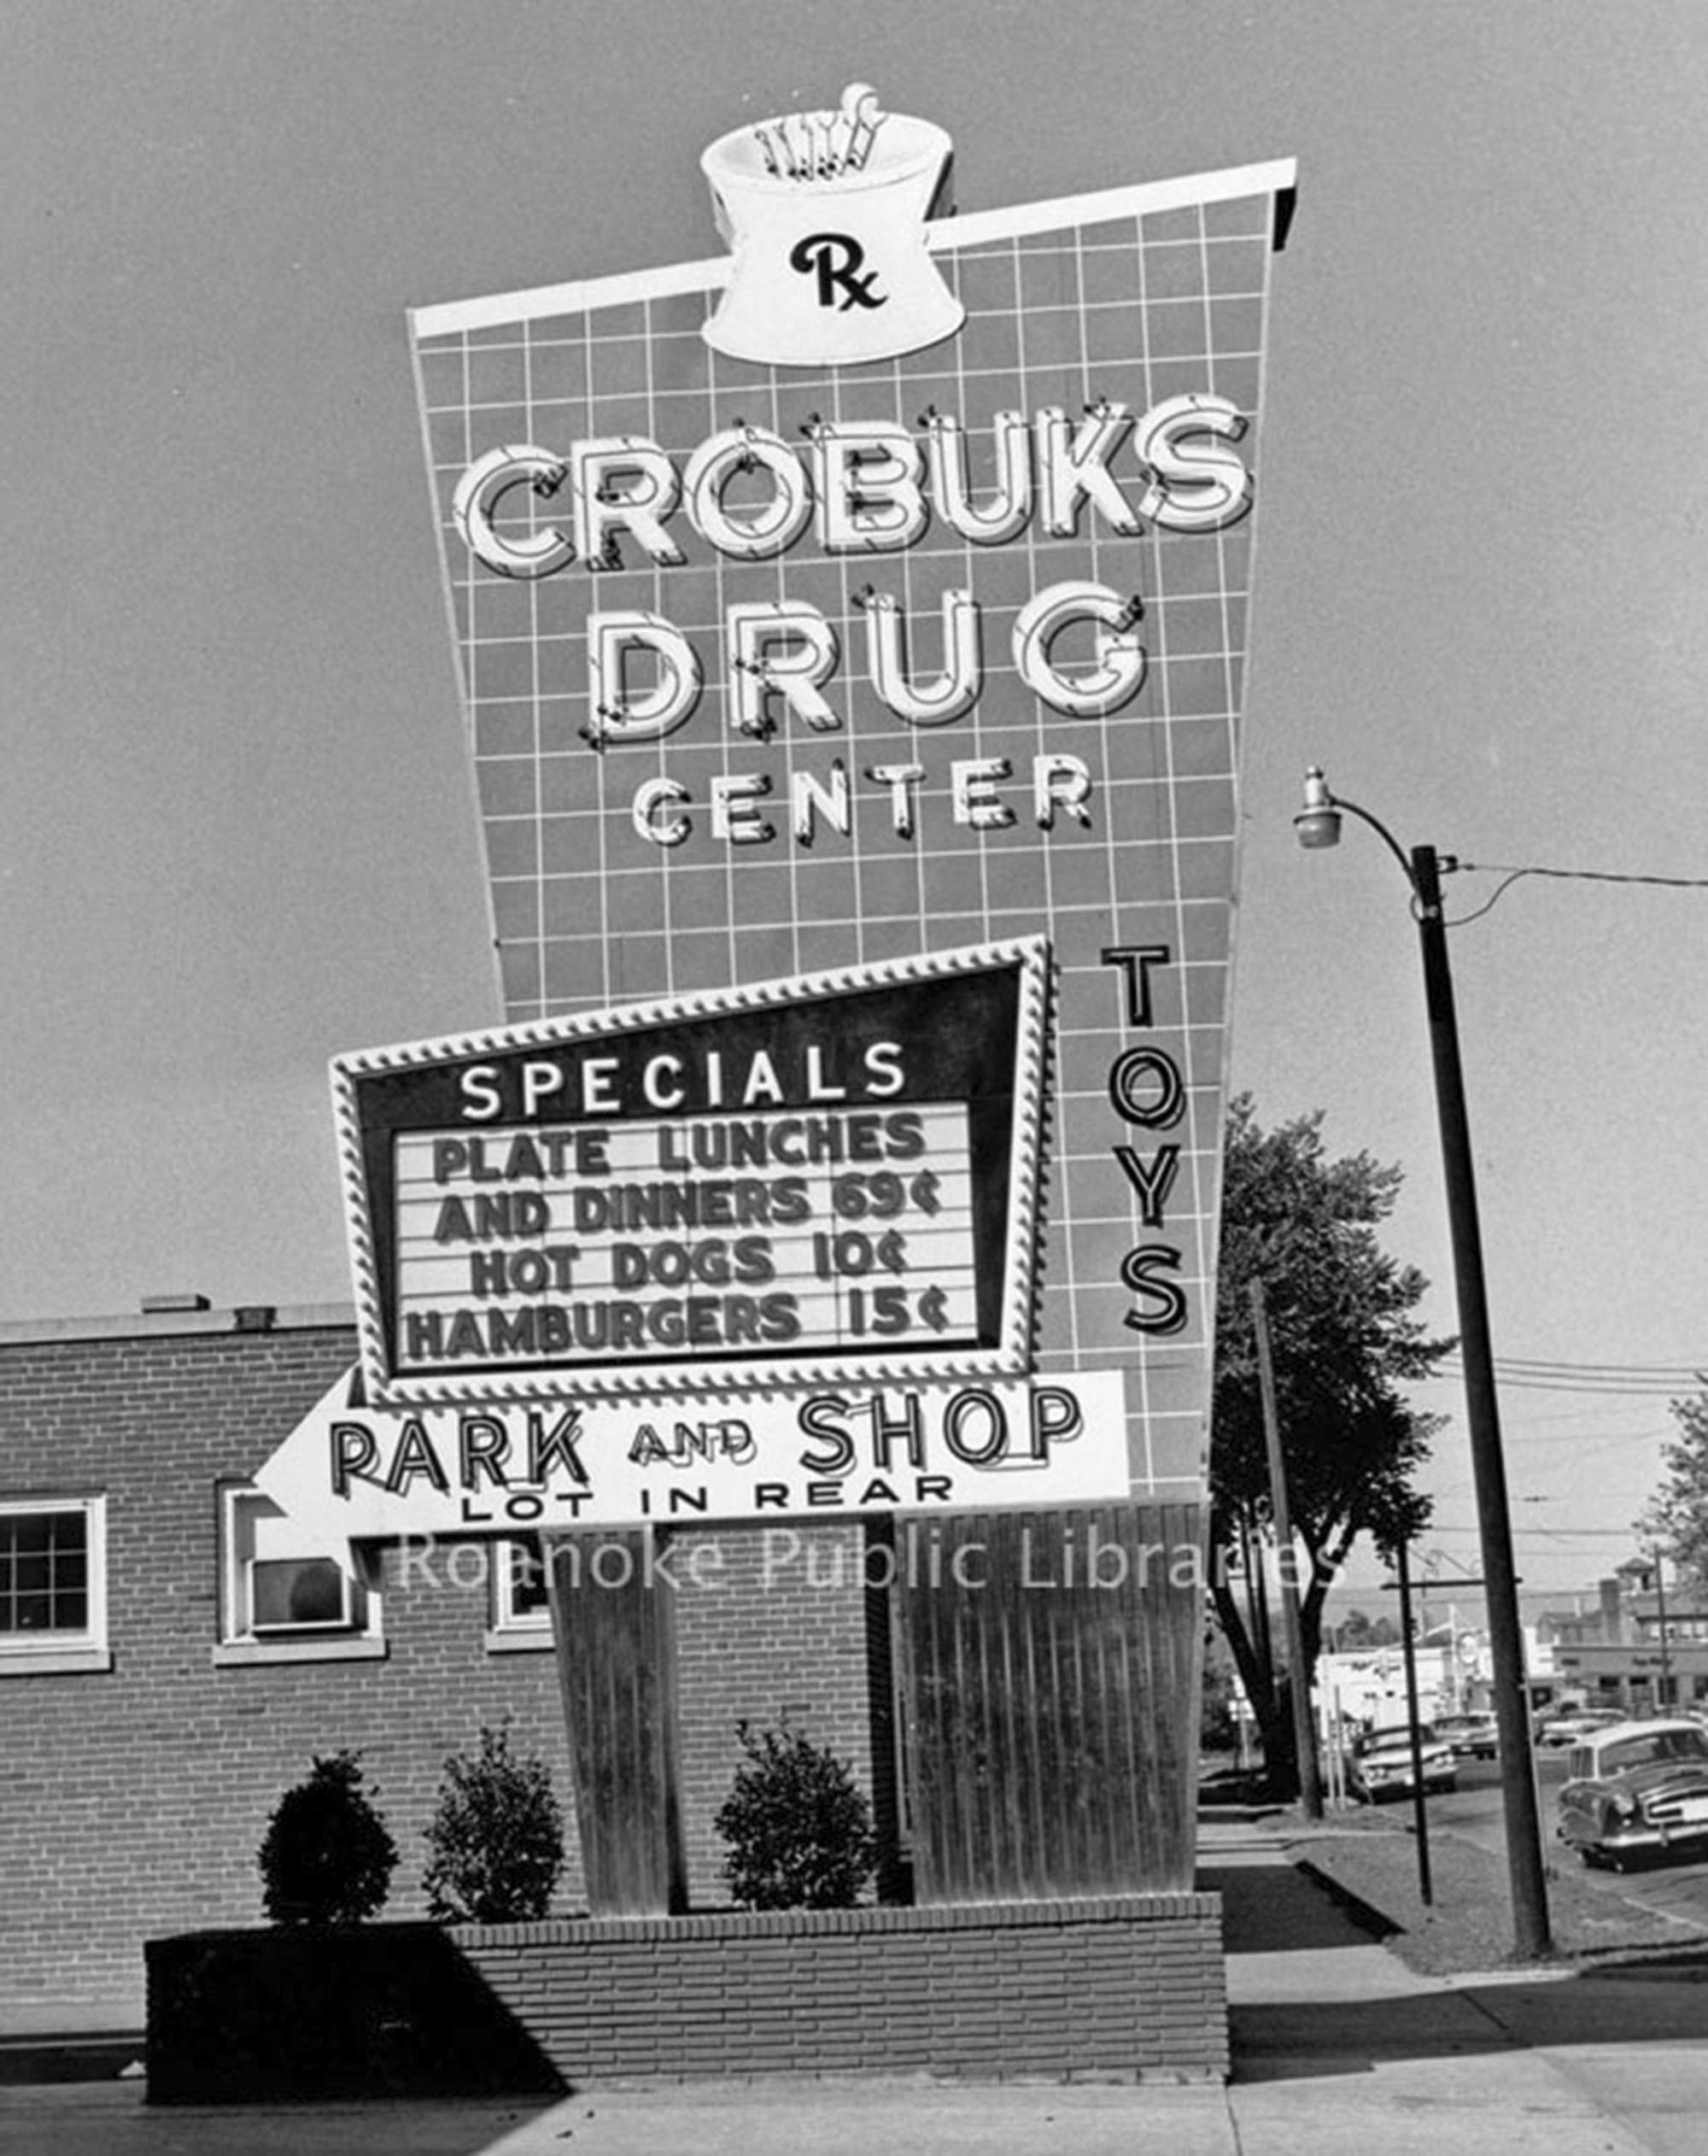 Davis 48.611 Crobuks Drug Center.jpg